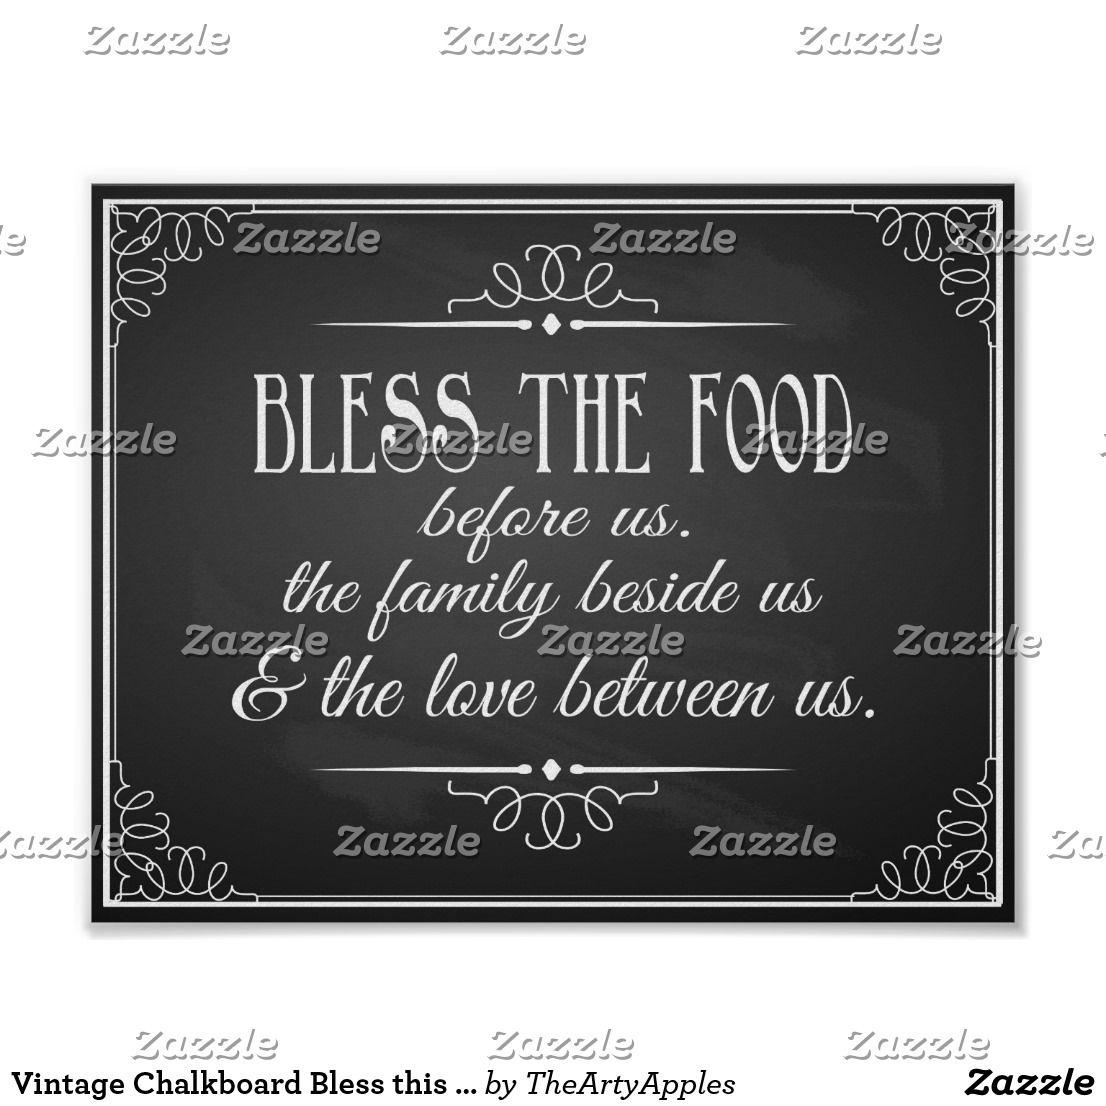 Vintage Chalkboard Bless this food wedding print